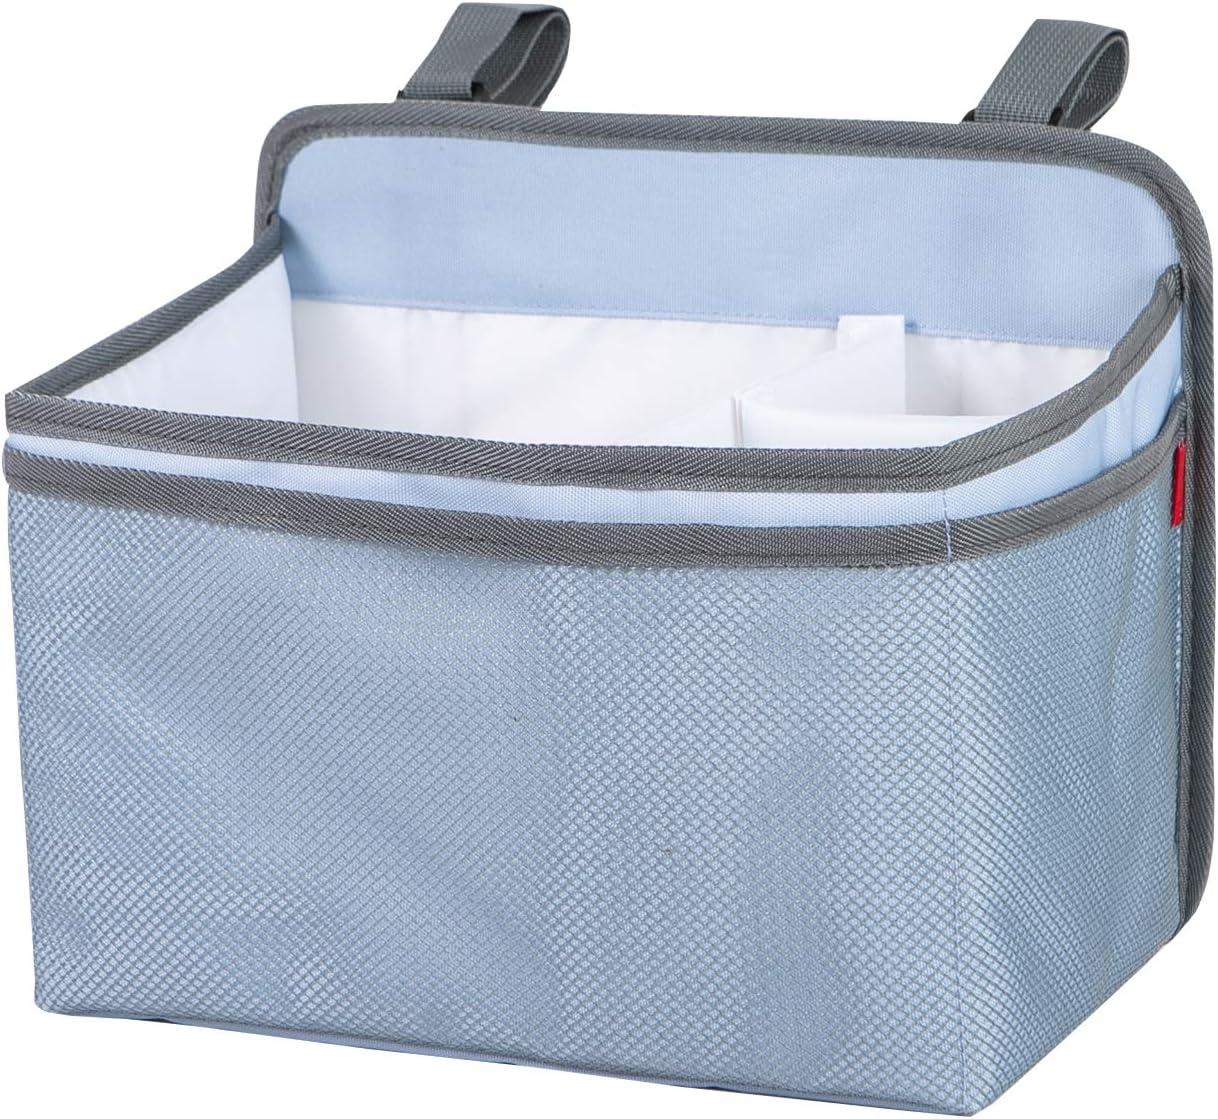 Babeboom Baby Diaper Organizer Storage , Hanging Organizers for Crib, Nursery Diaper Stackers, Baby Essentials Organiser Caddy (BLUE 1PCS)